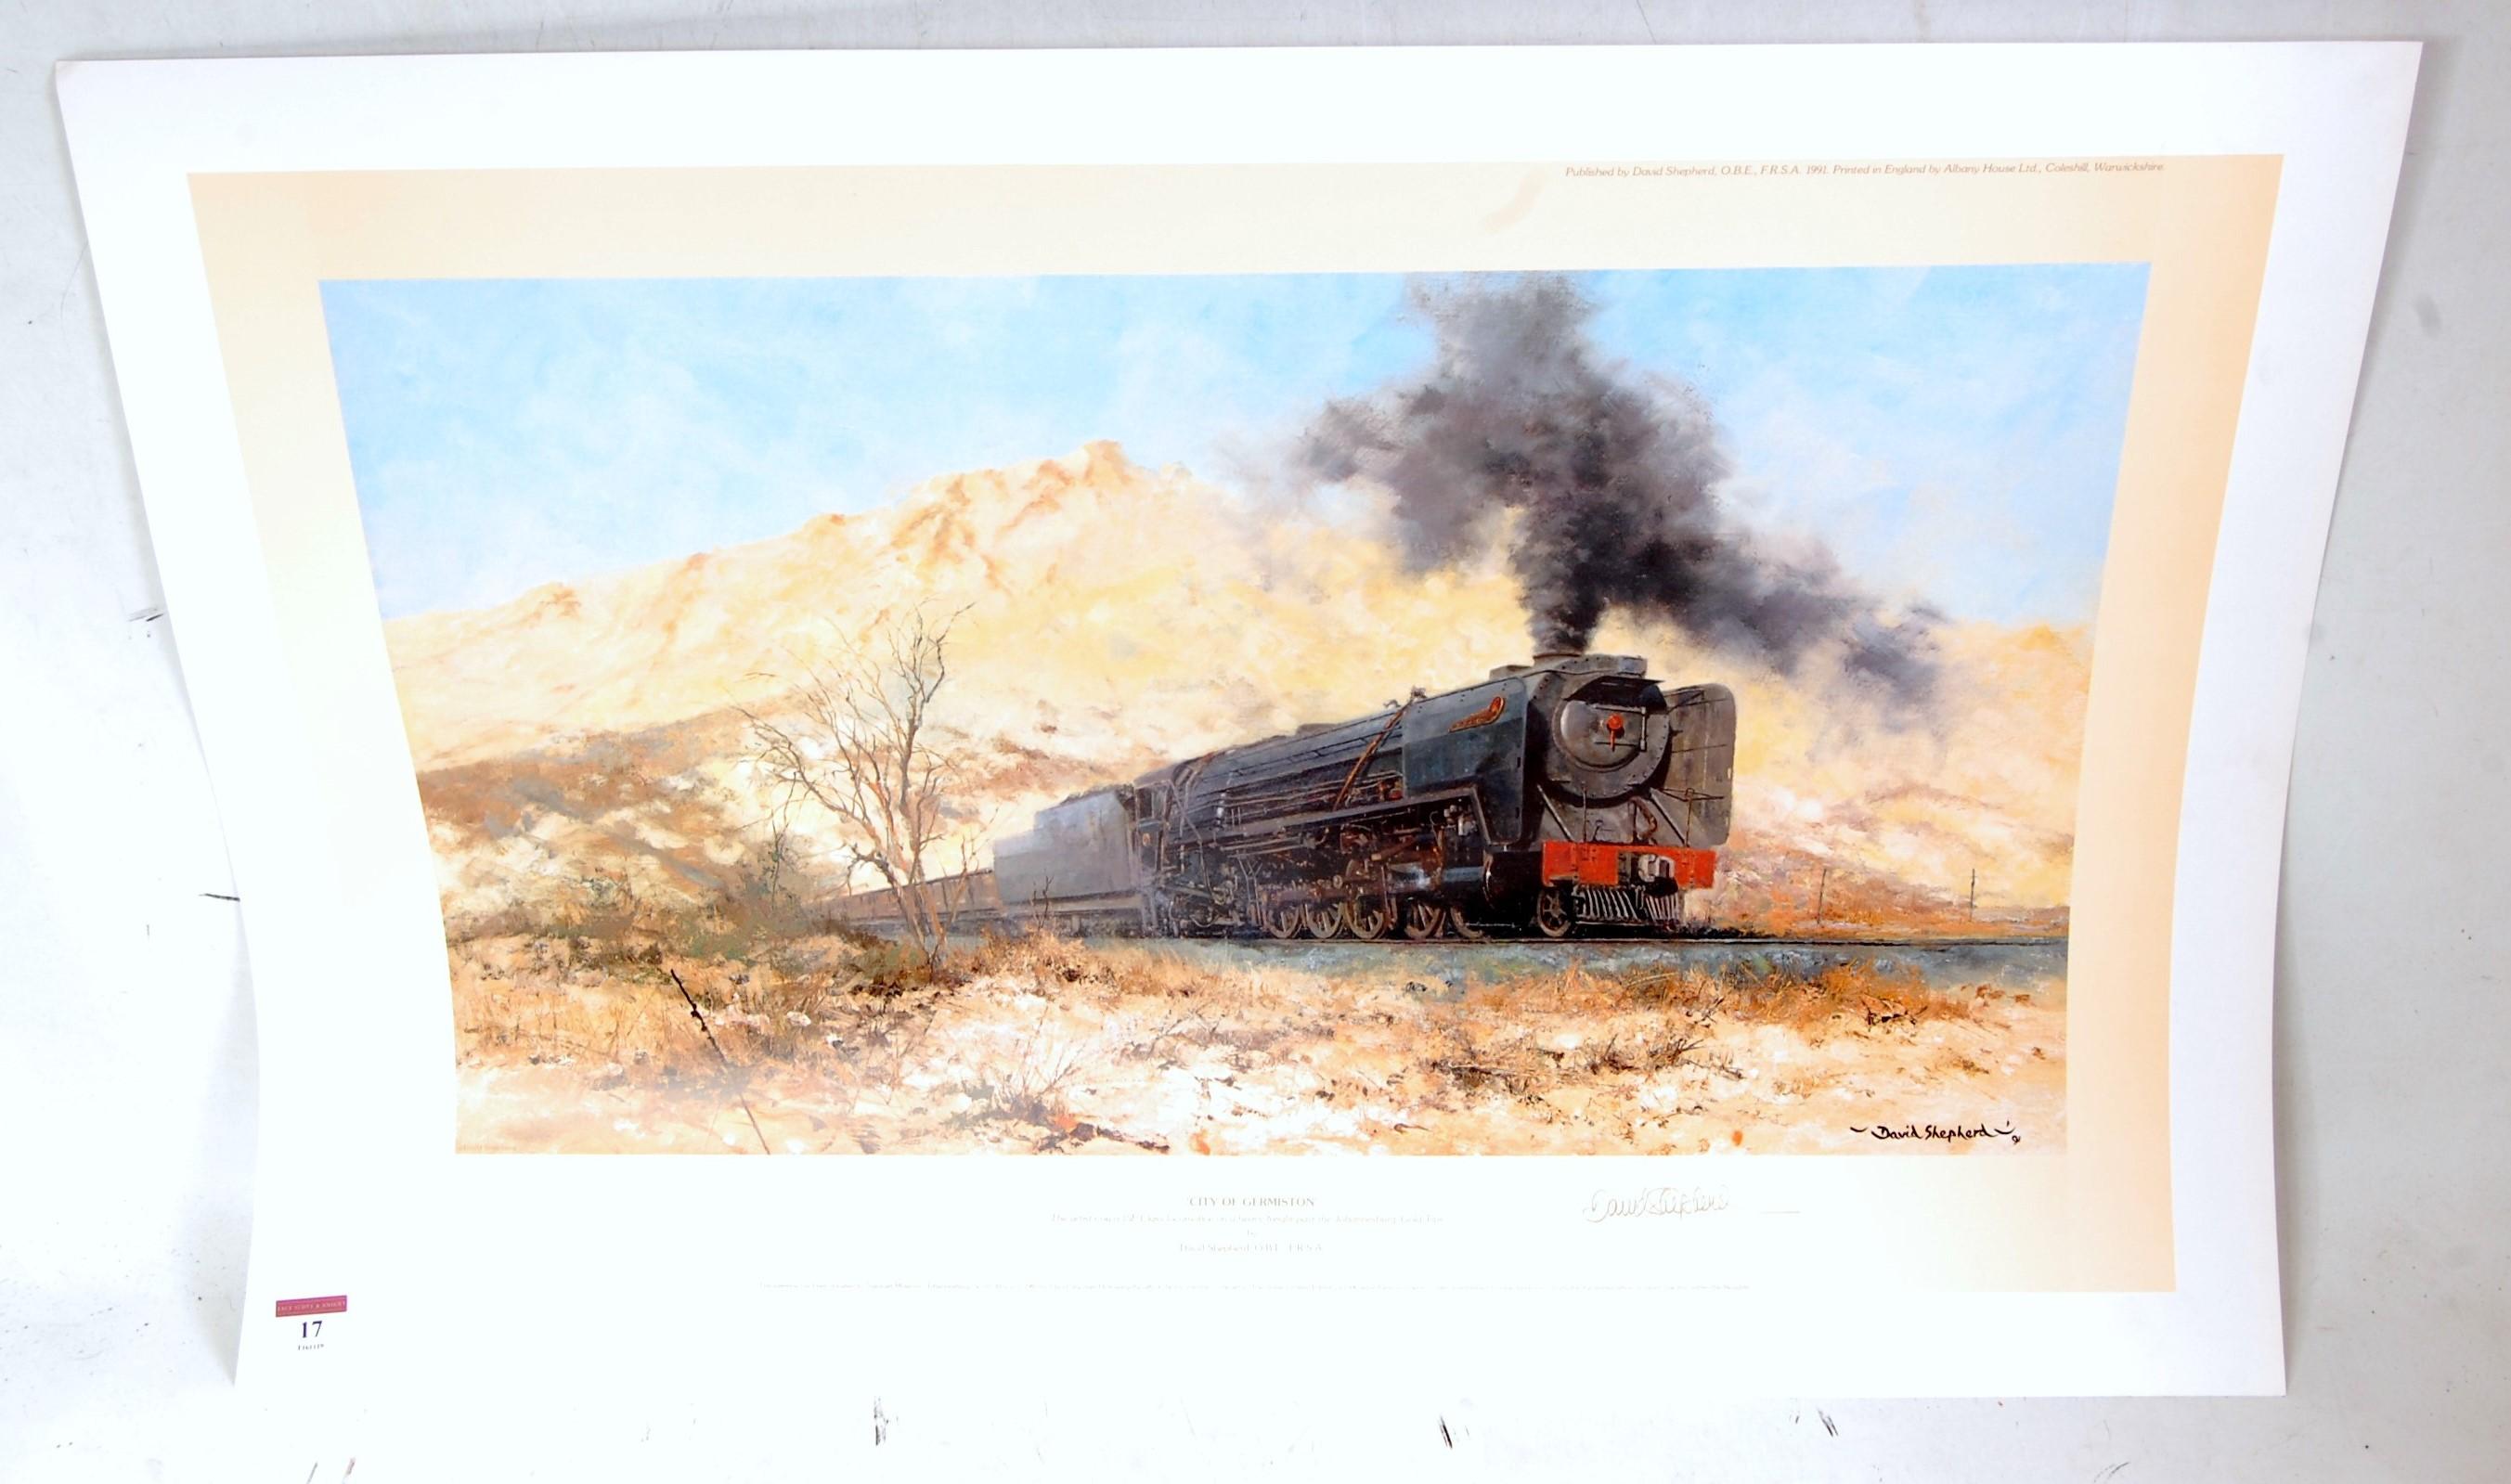 Lot 17 - An original hand signed David Shepherd railway print titled 'City of Germiston', limited edition